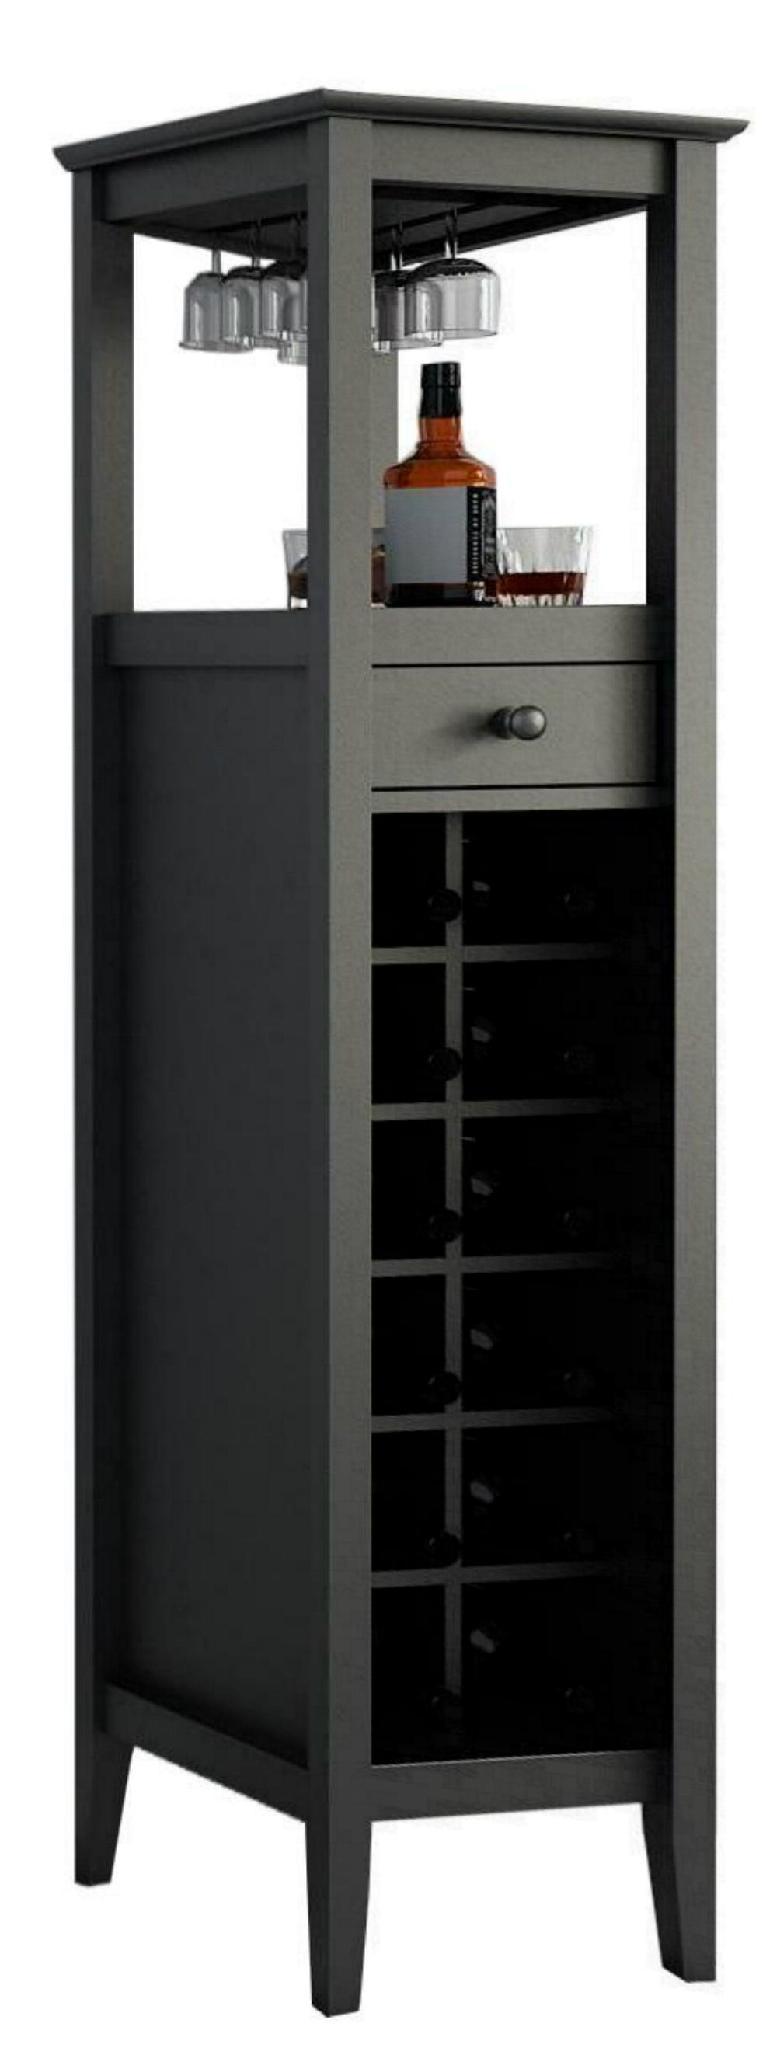 12 Bottles Modern Home Slim Tall Storage Wine Bar Cabinet Tower ...